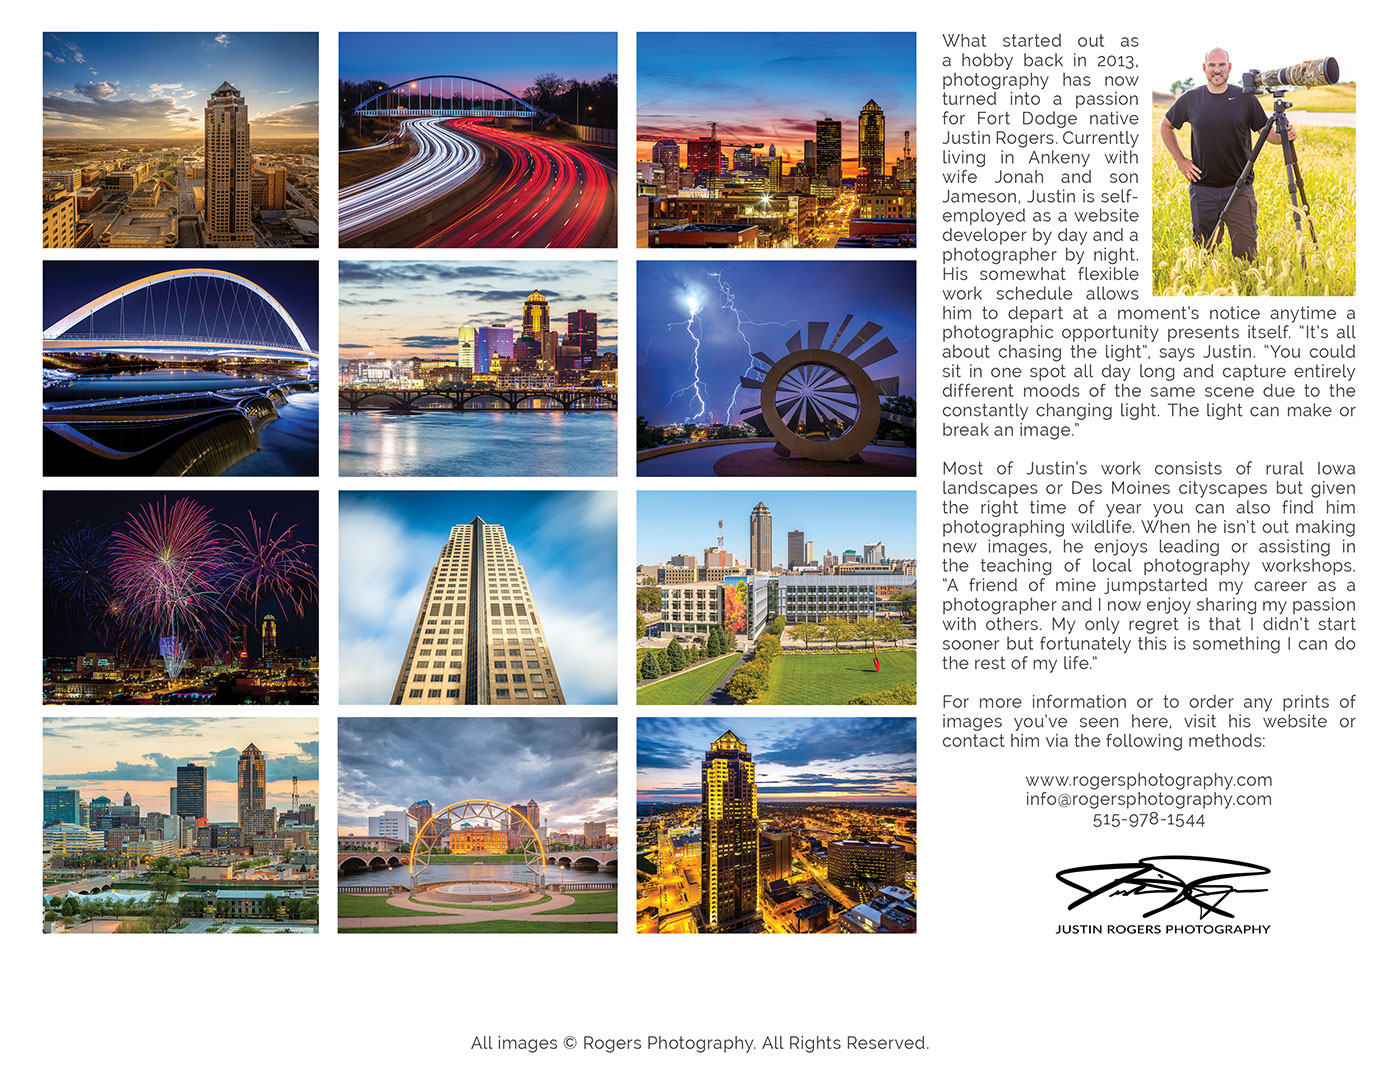 2021-des-moines-cityscapes-back-cover